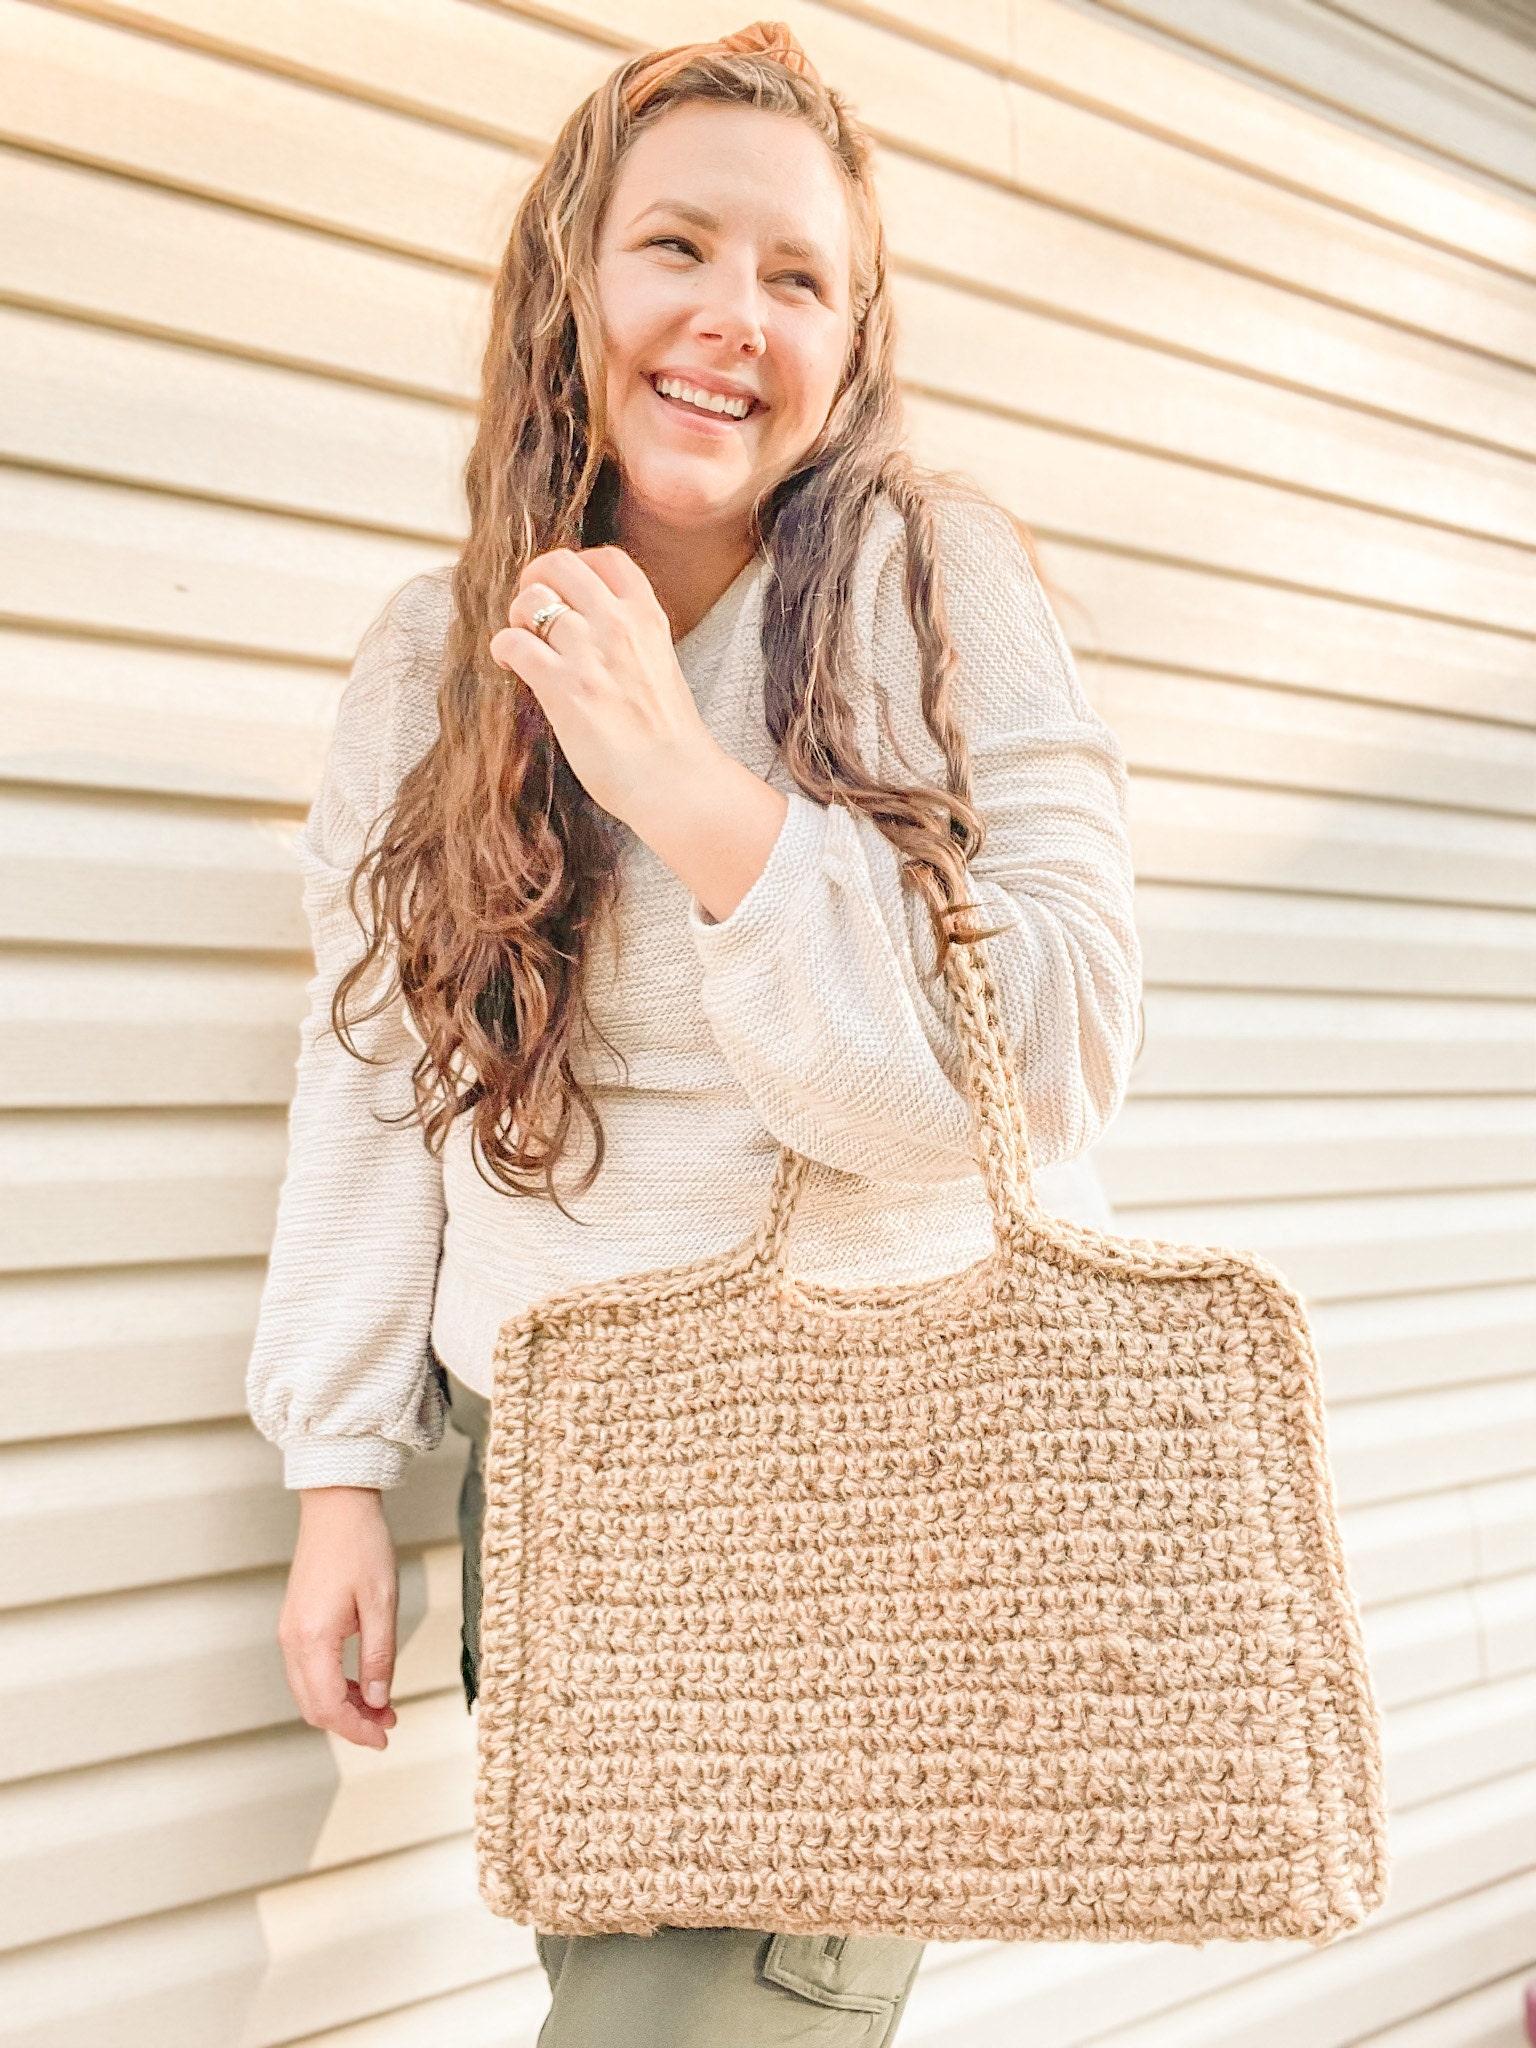 Woman carrying a crochet, jute laptop bag